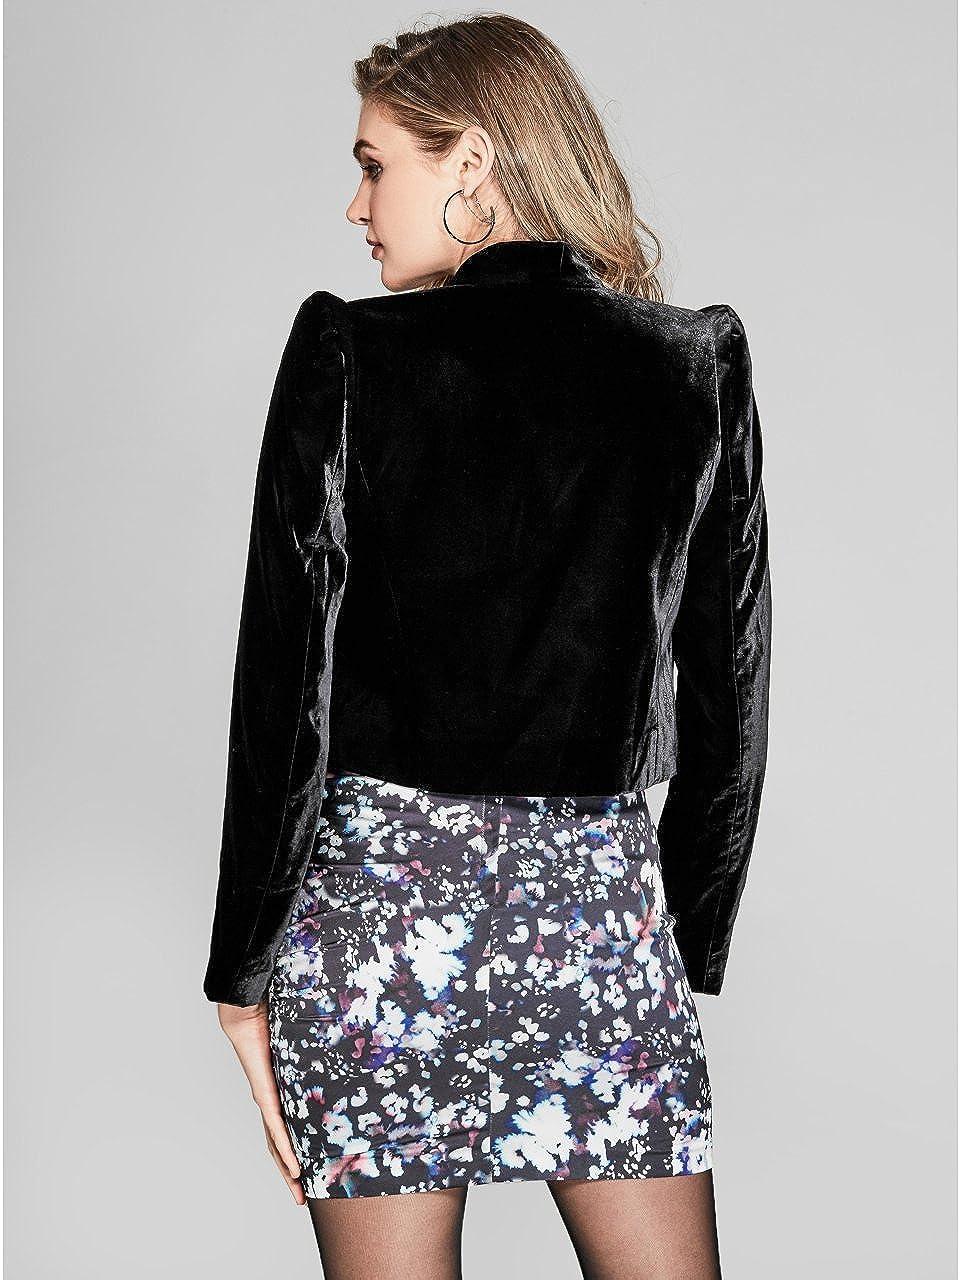 Amazon.com: Guess By Marciano Lexie Cropped Blazer de ...